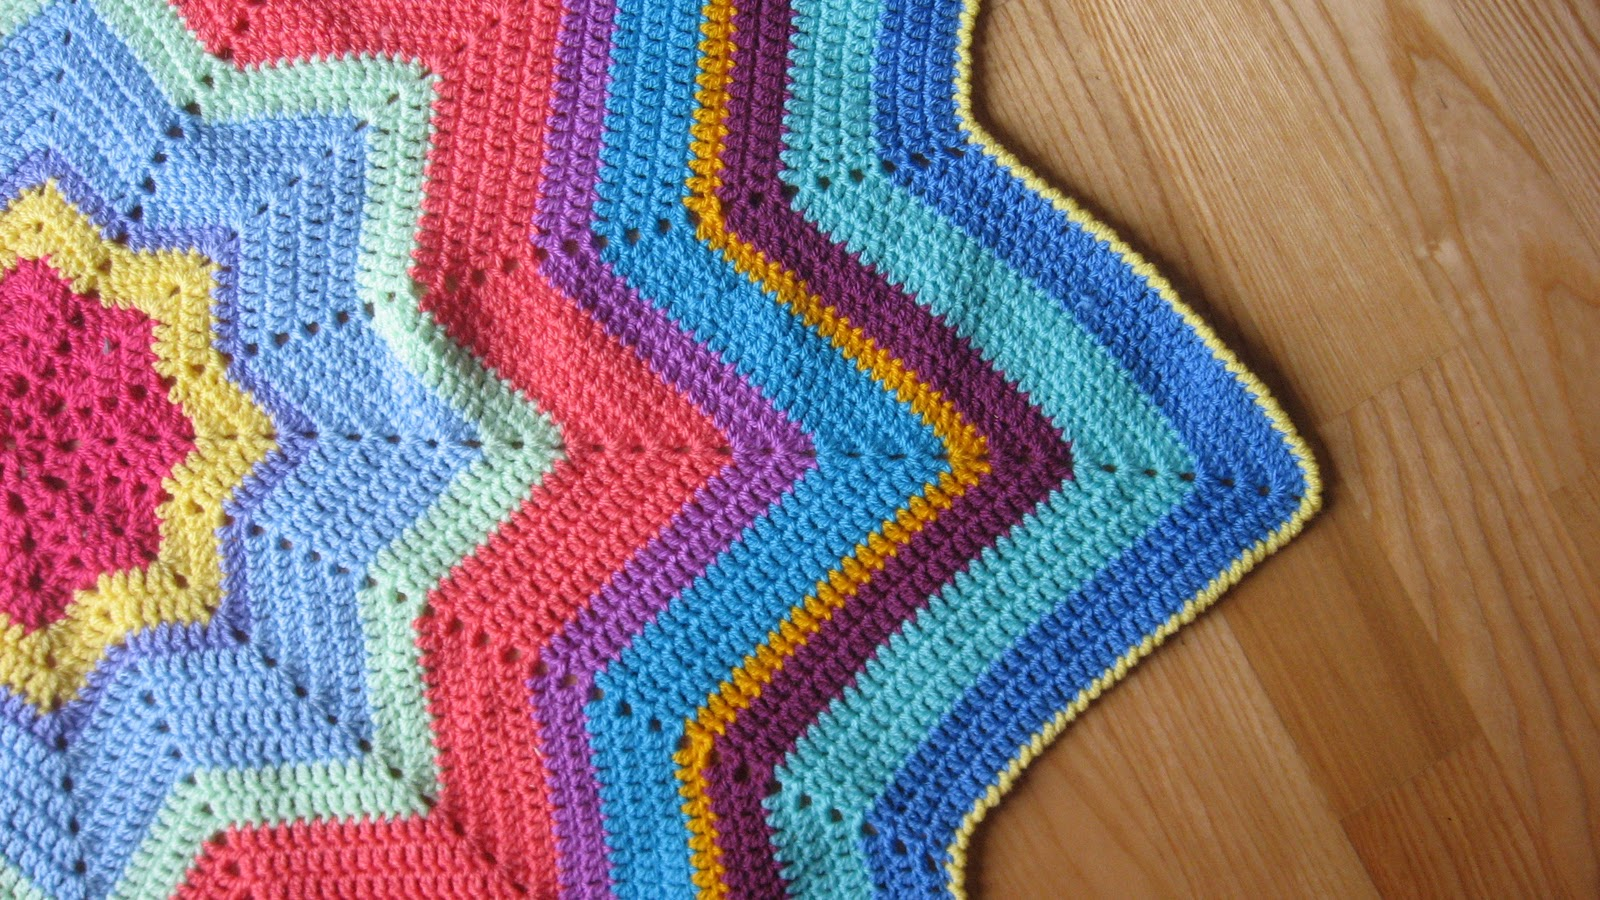 project linus crochet patterns Exotic crochet cruisers hook up 25 project linus afghans crochet cruise   cute crochet amigurumi patterns 32 project linus afghans →.